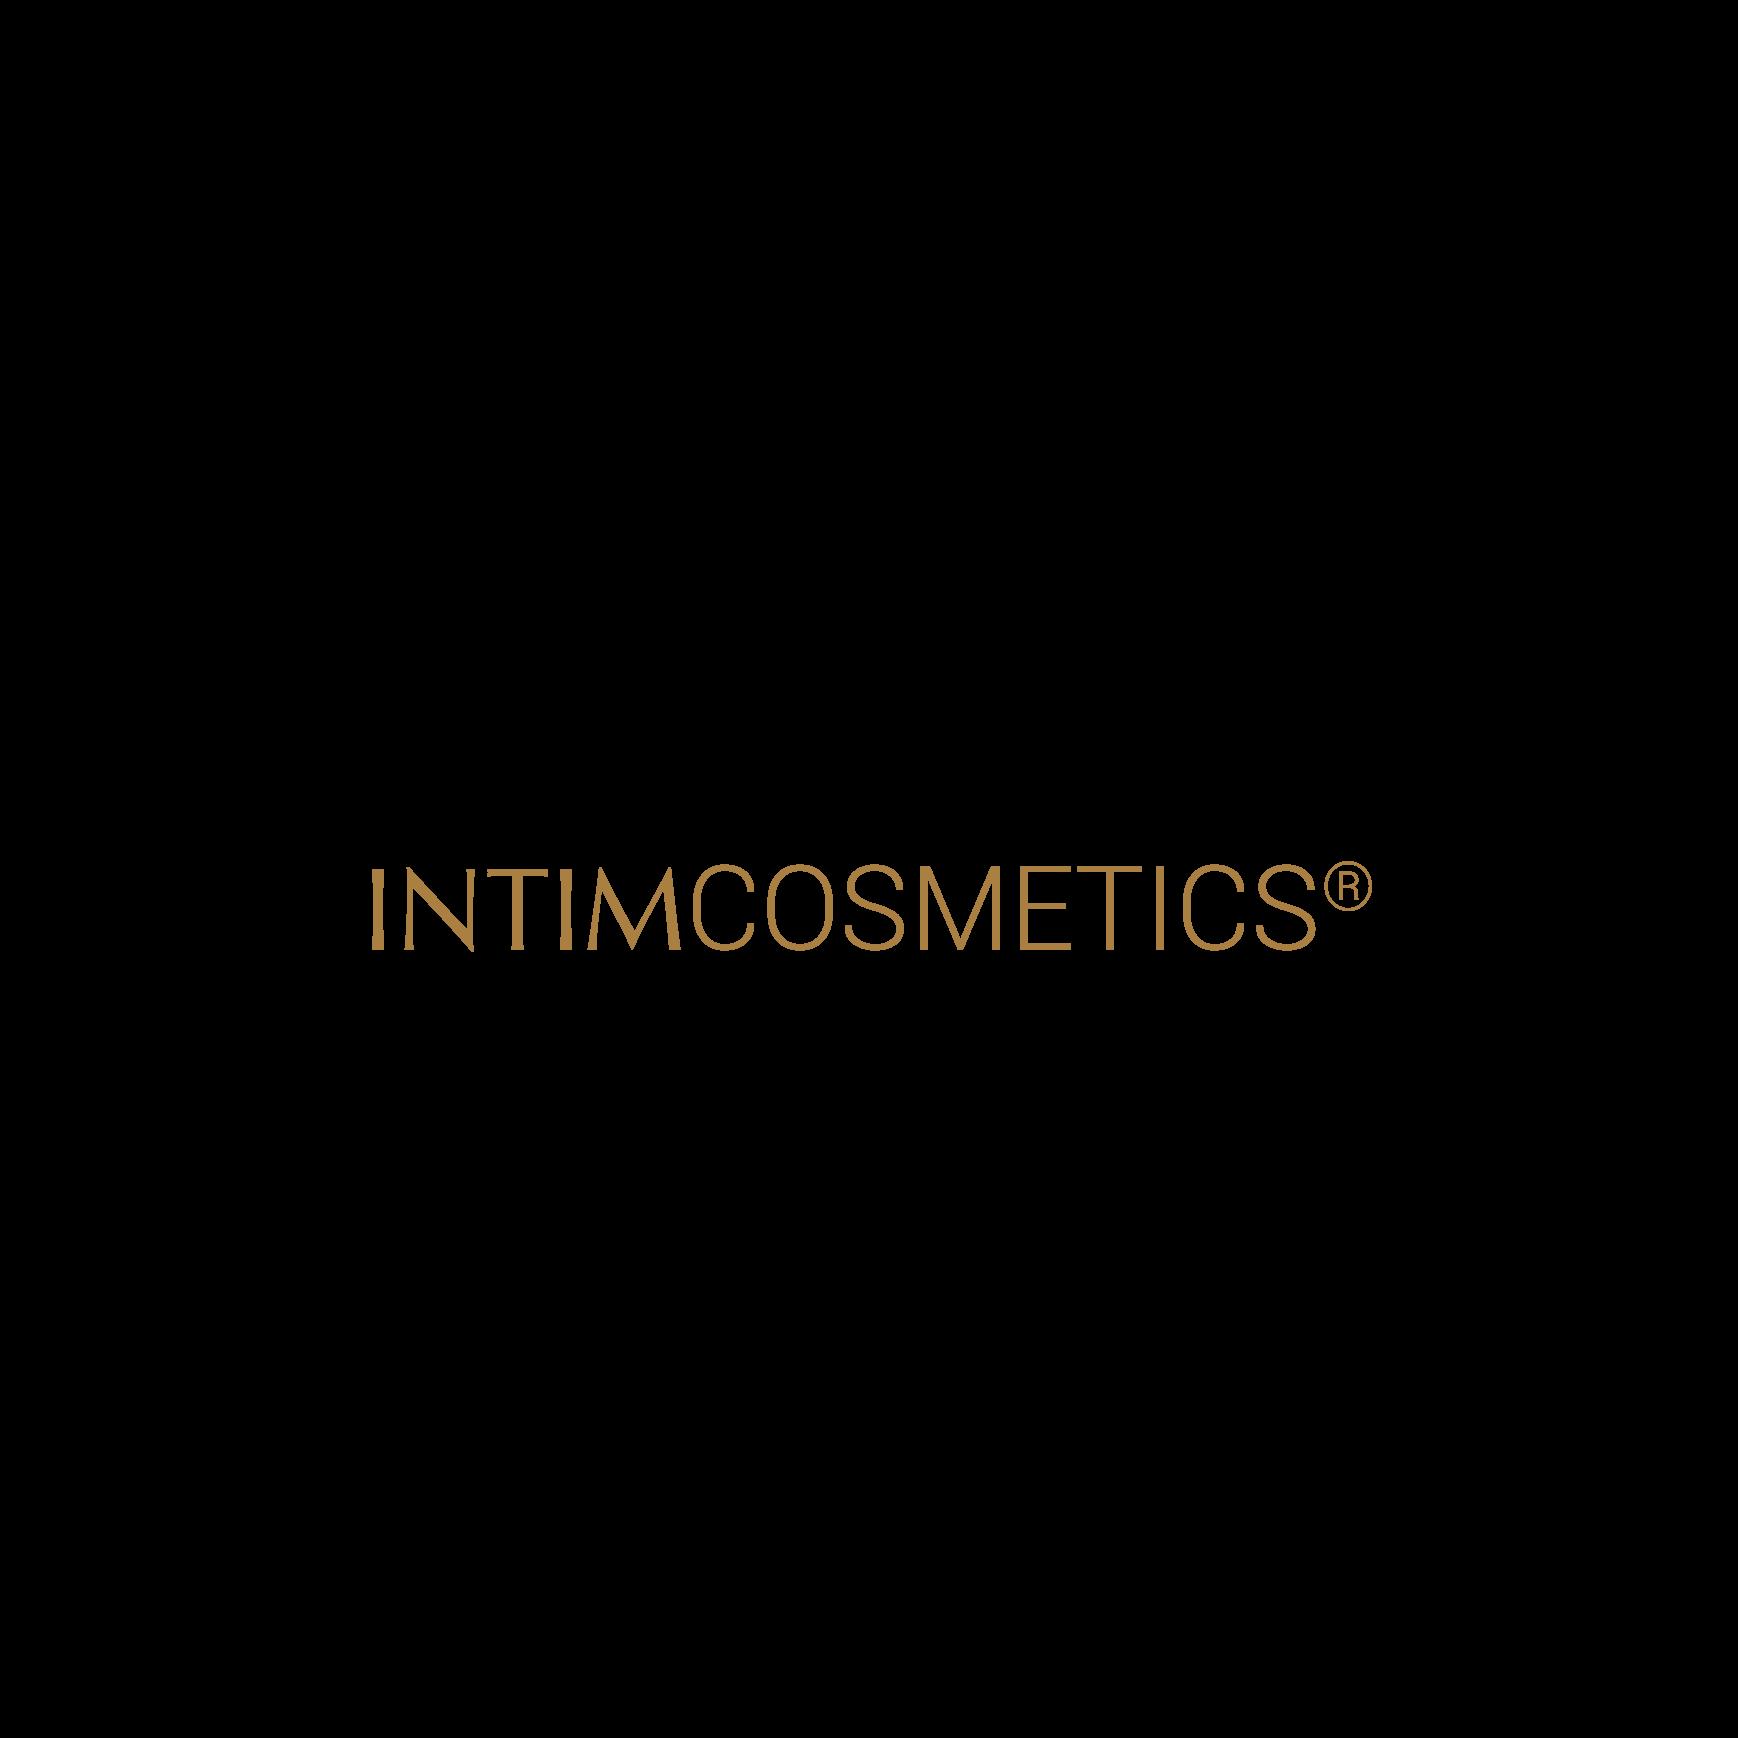 IntimCosmetic